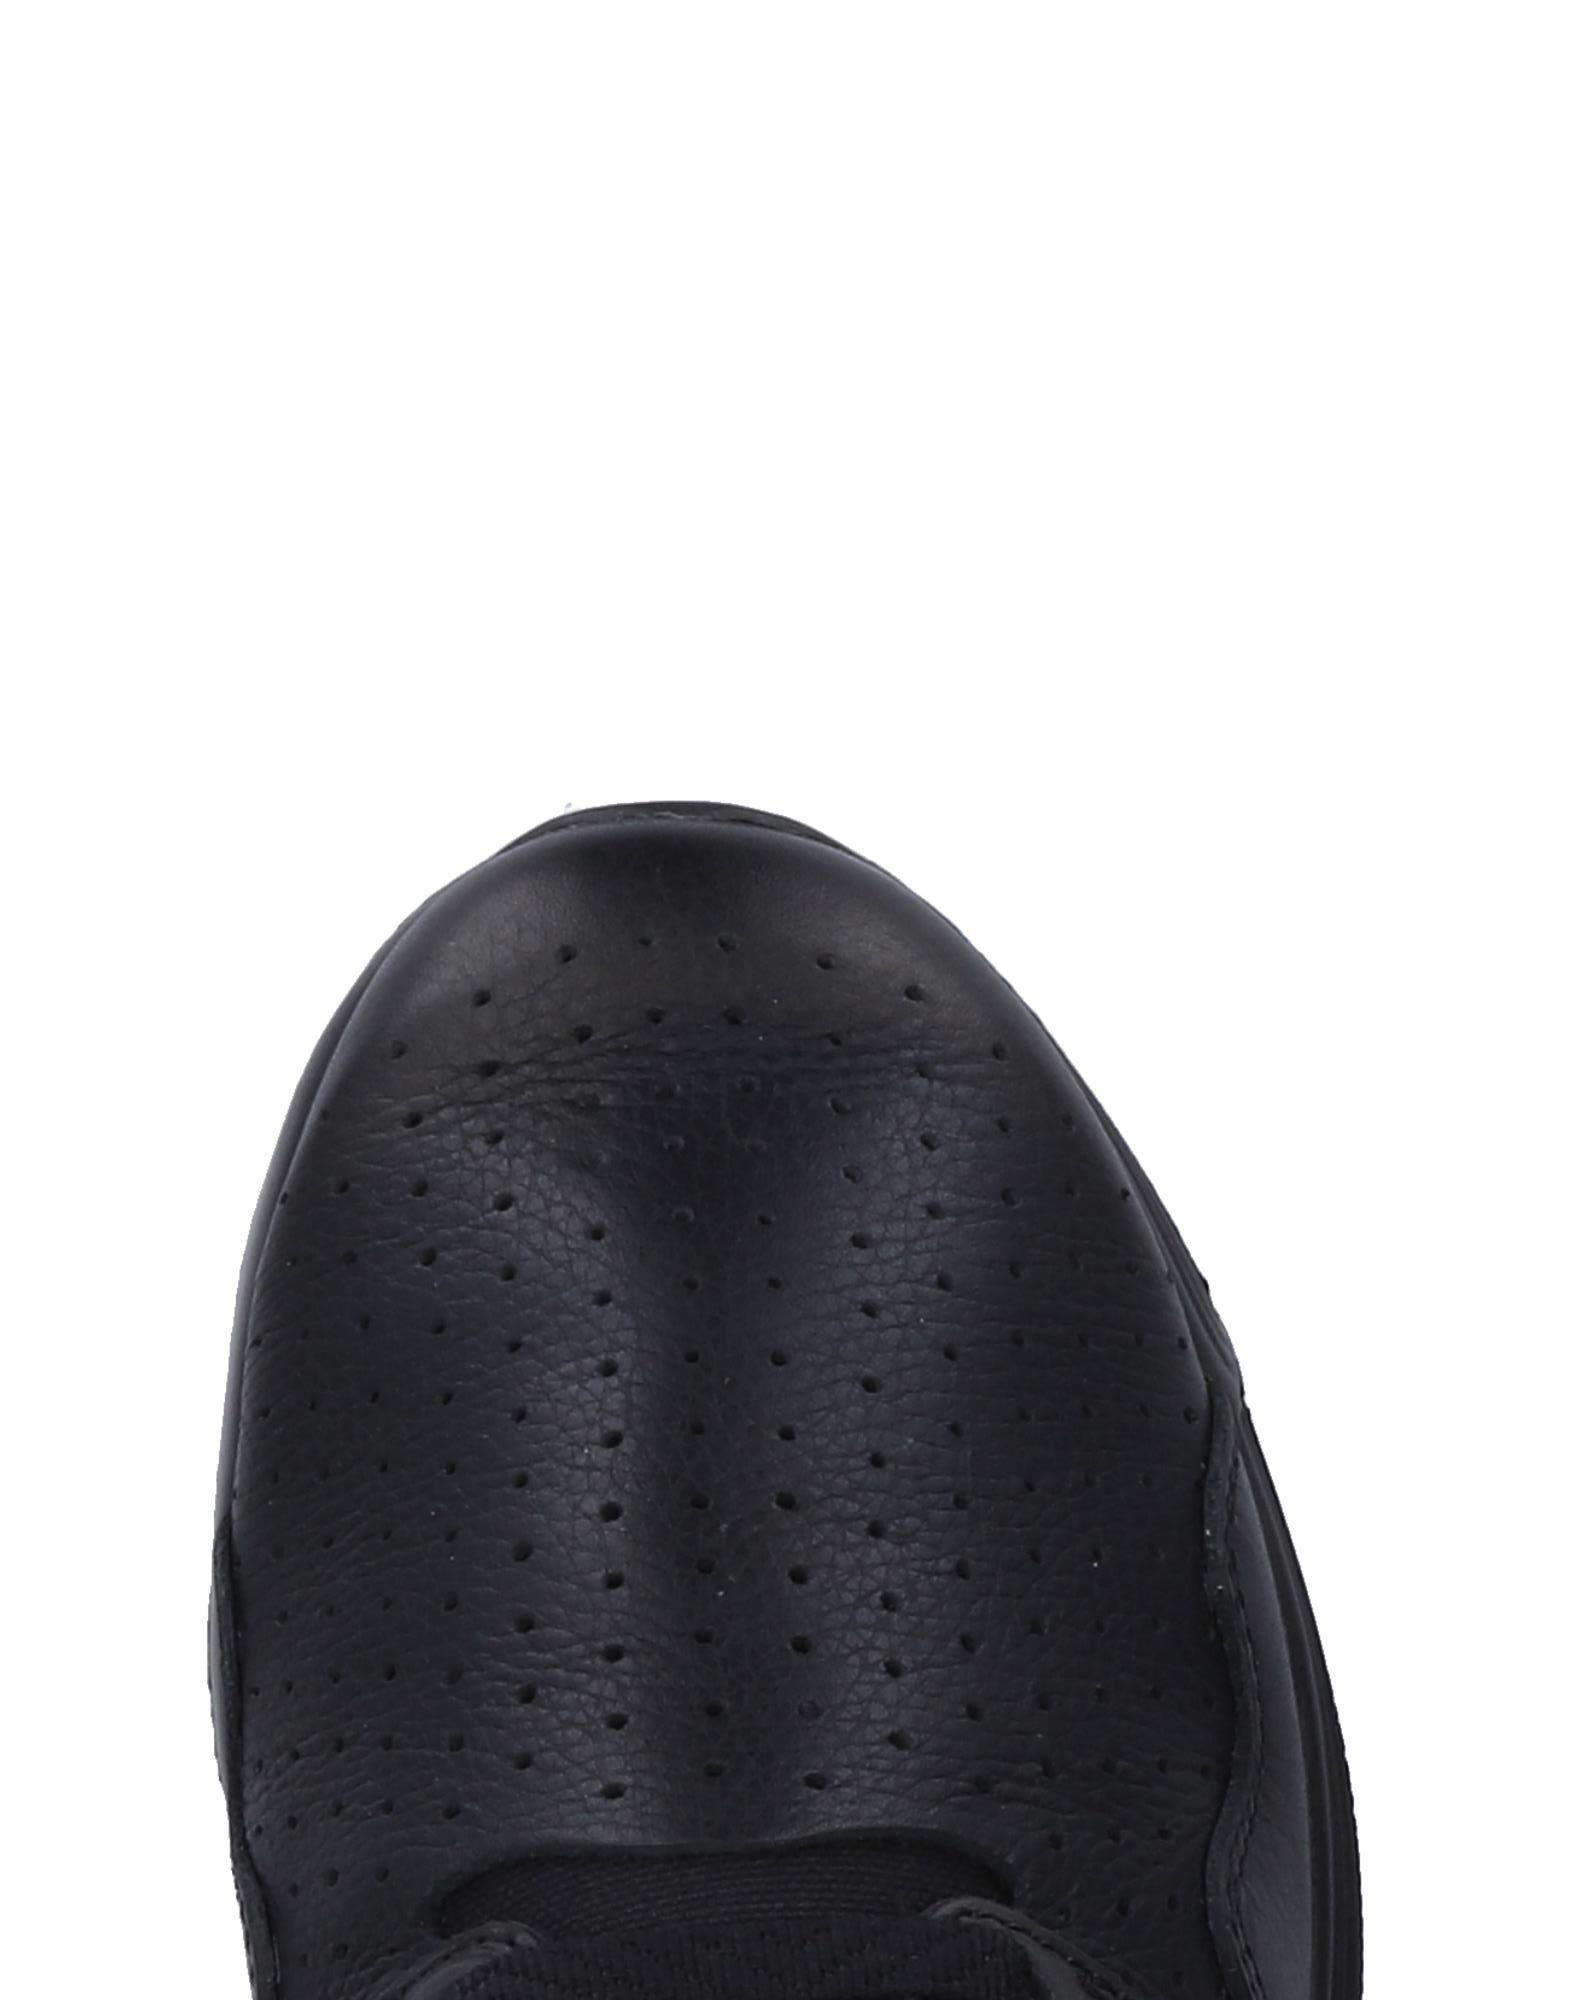 Rabatt echte Schuhe Herren Nike Sneakers Herren Schuhe  11521055FO bf10f2